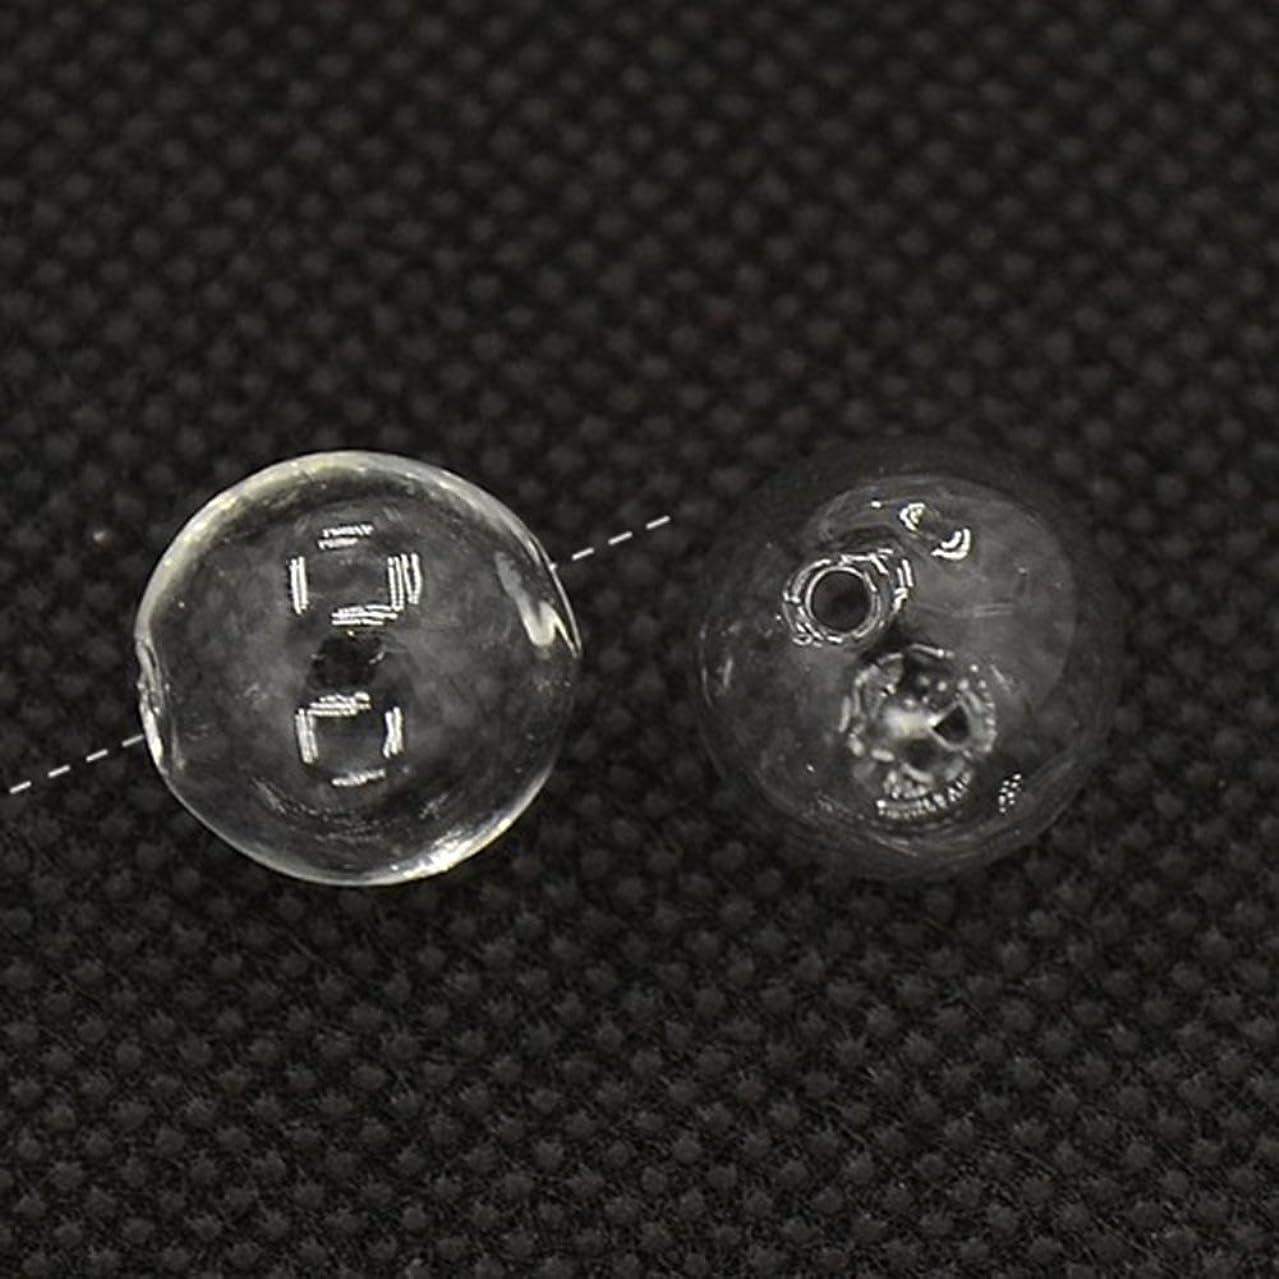 NBEADS 100 Pcs 13mm Handmade Round Blown Glass Globe Beads Wish Glass Ball Bottles DIY Pendant Charms Craft